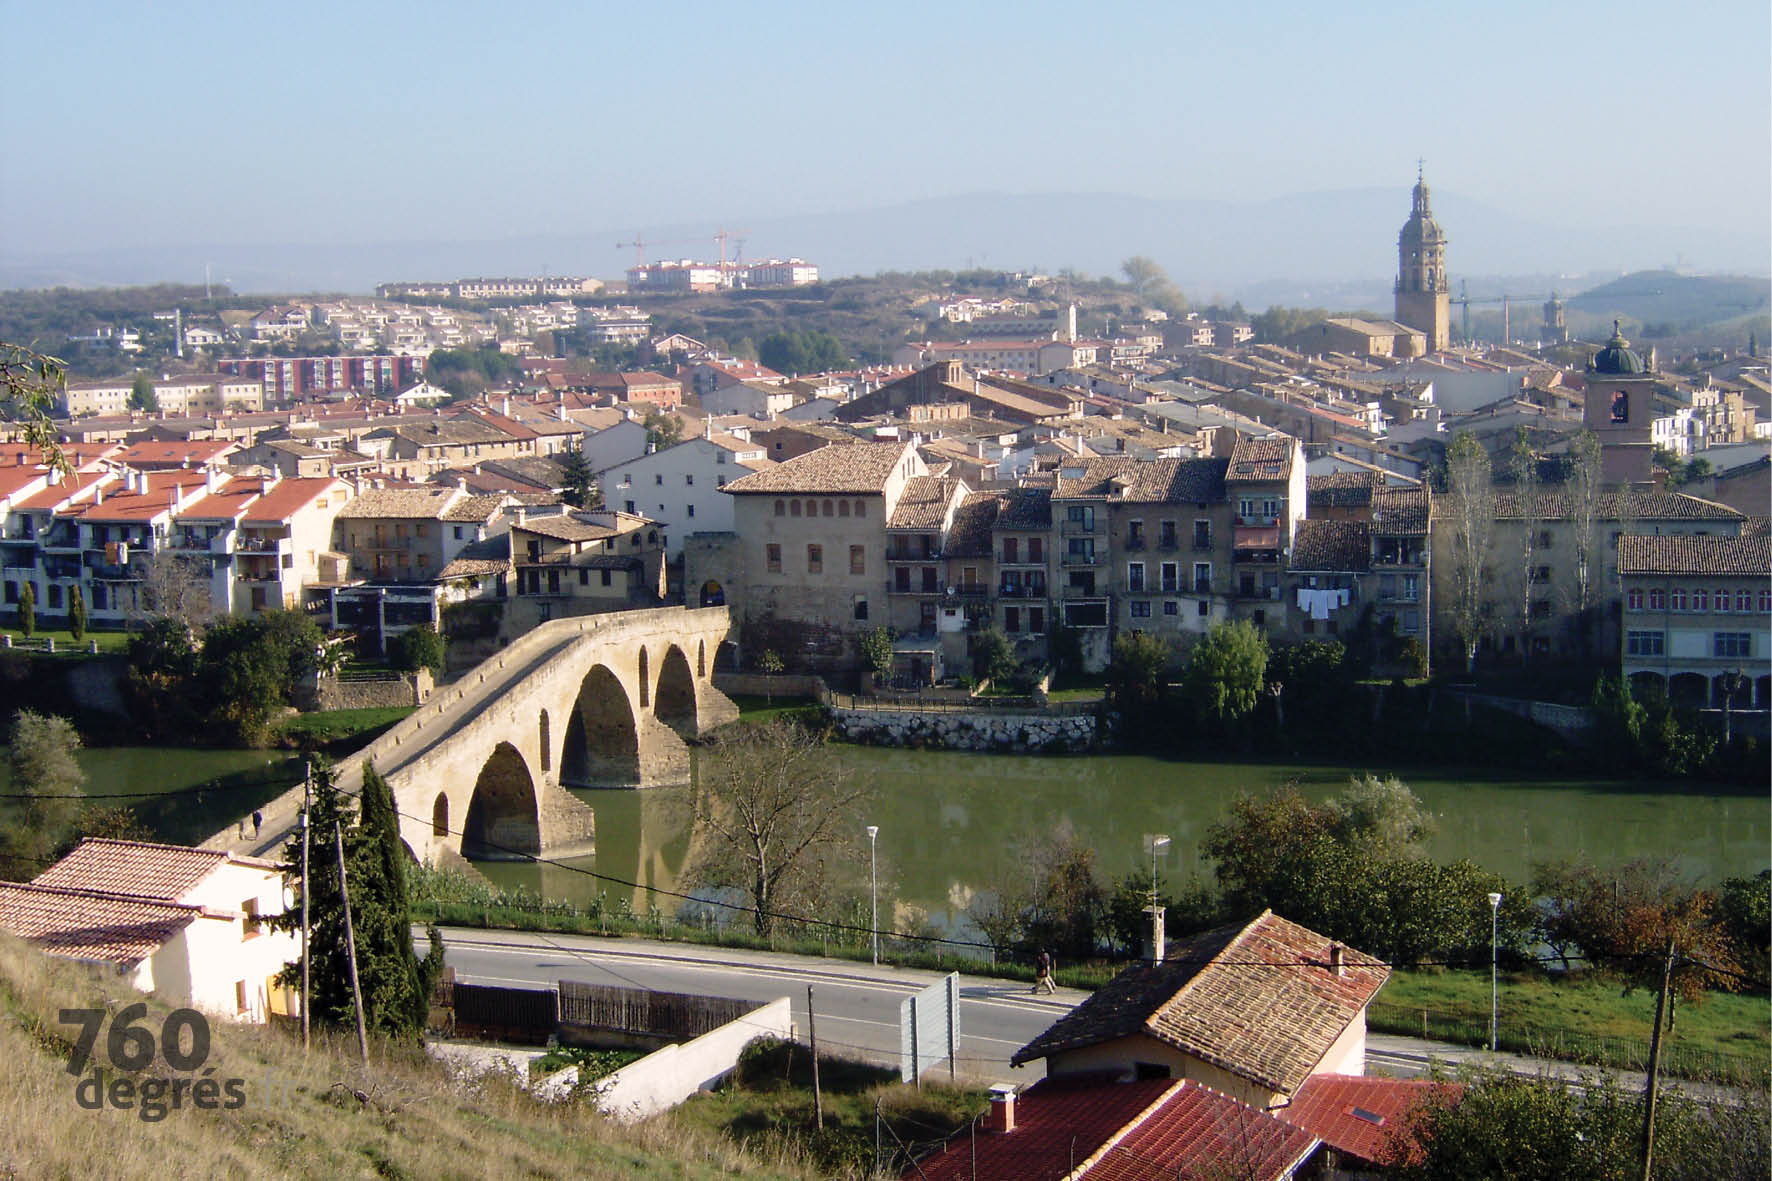 760degres-pays-basque-puente-la-reina-01